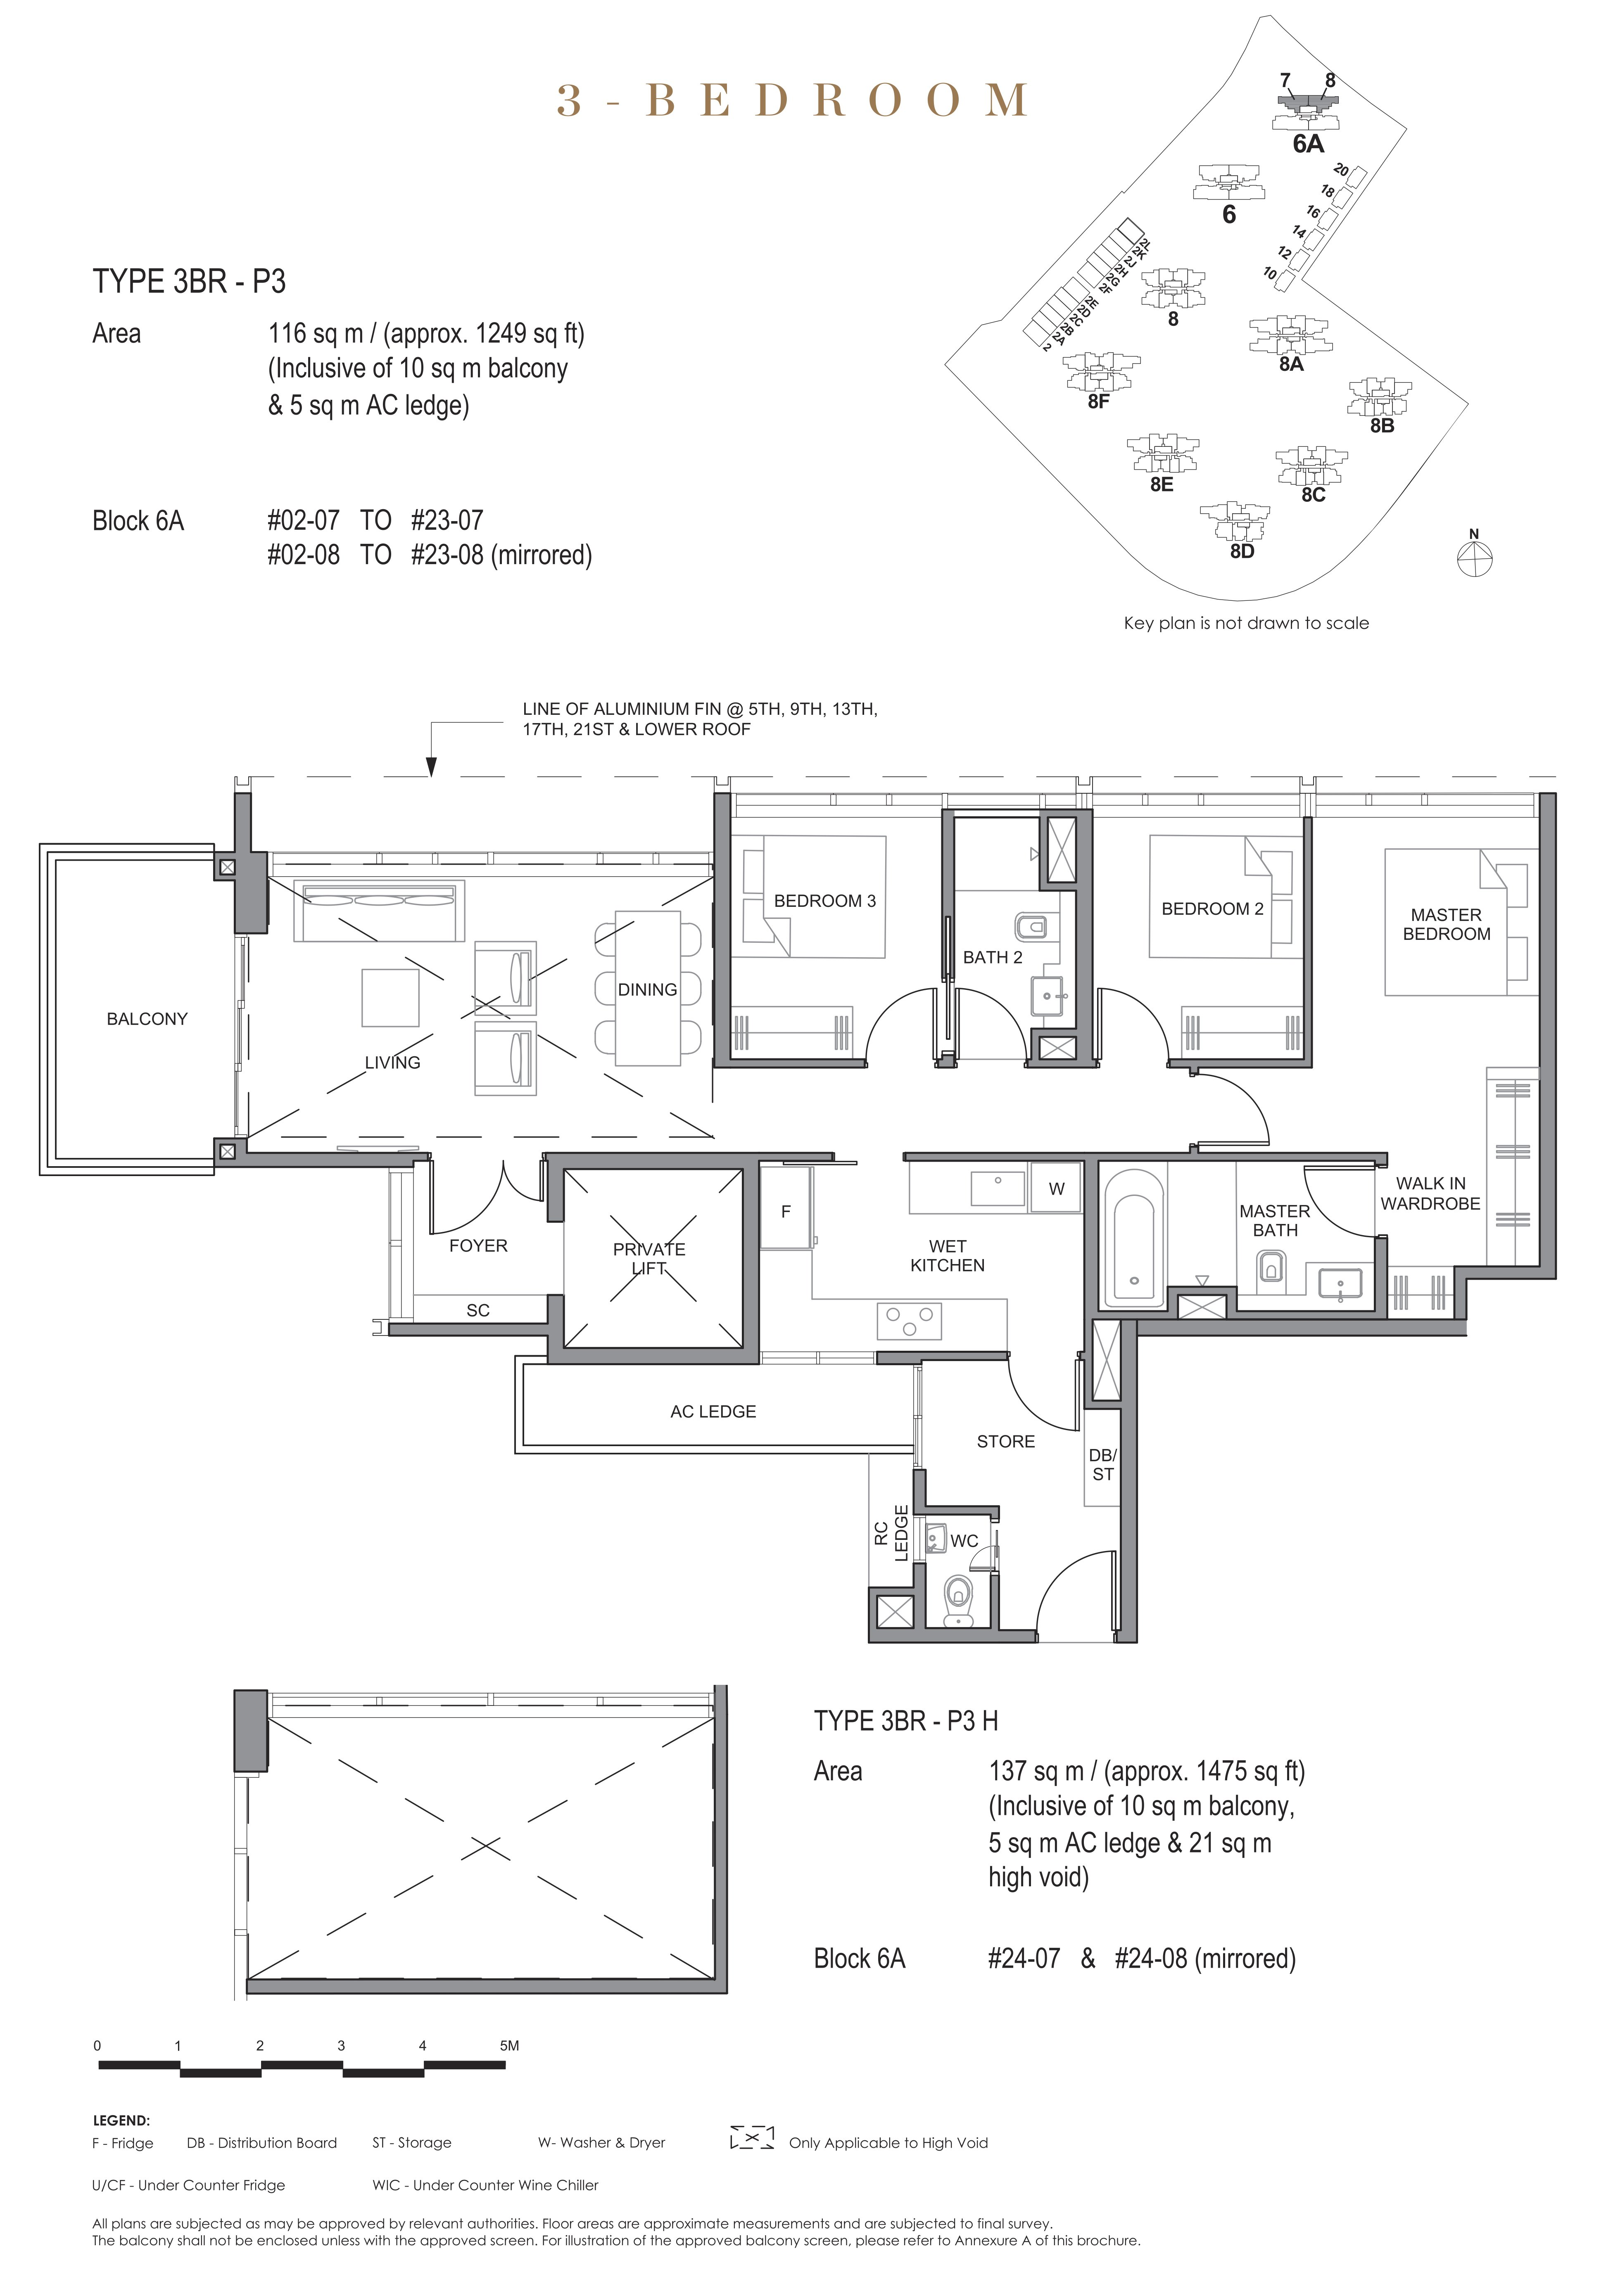 Parc Clematis 锦泰门第 signature 3 bedroom 3卧房 3BR-P3